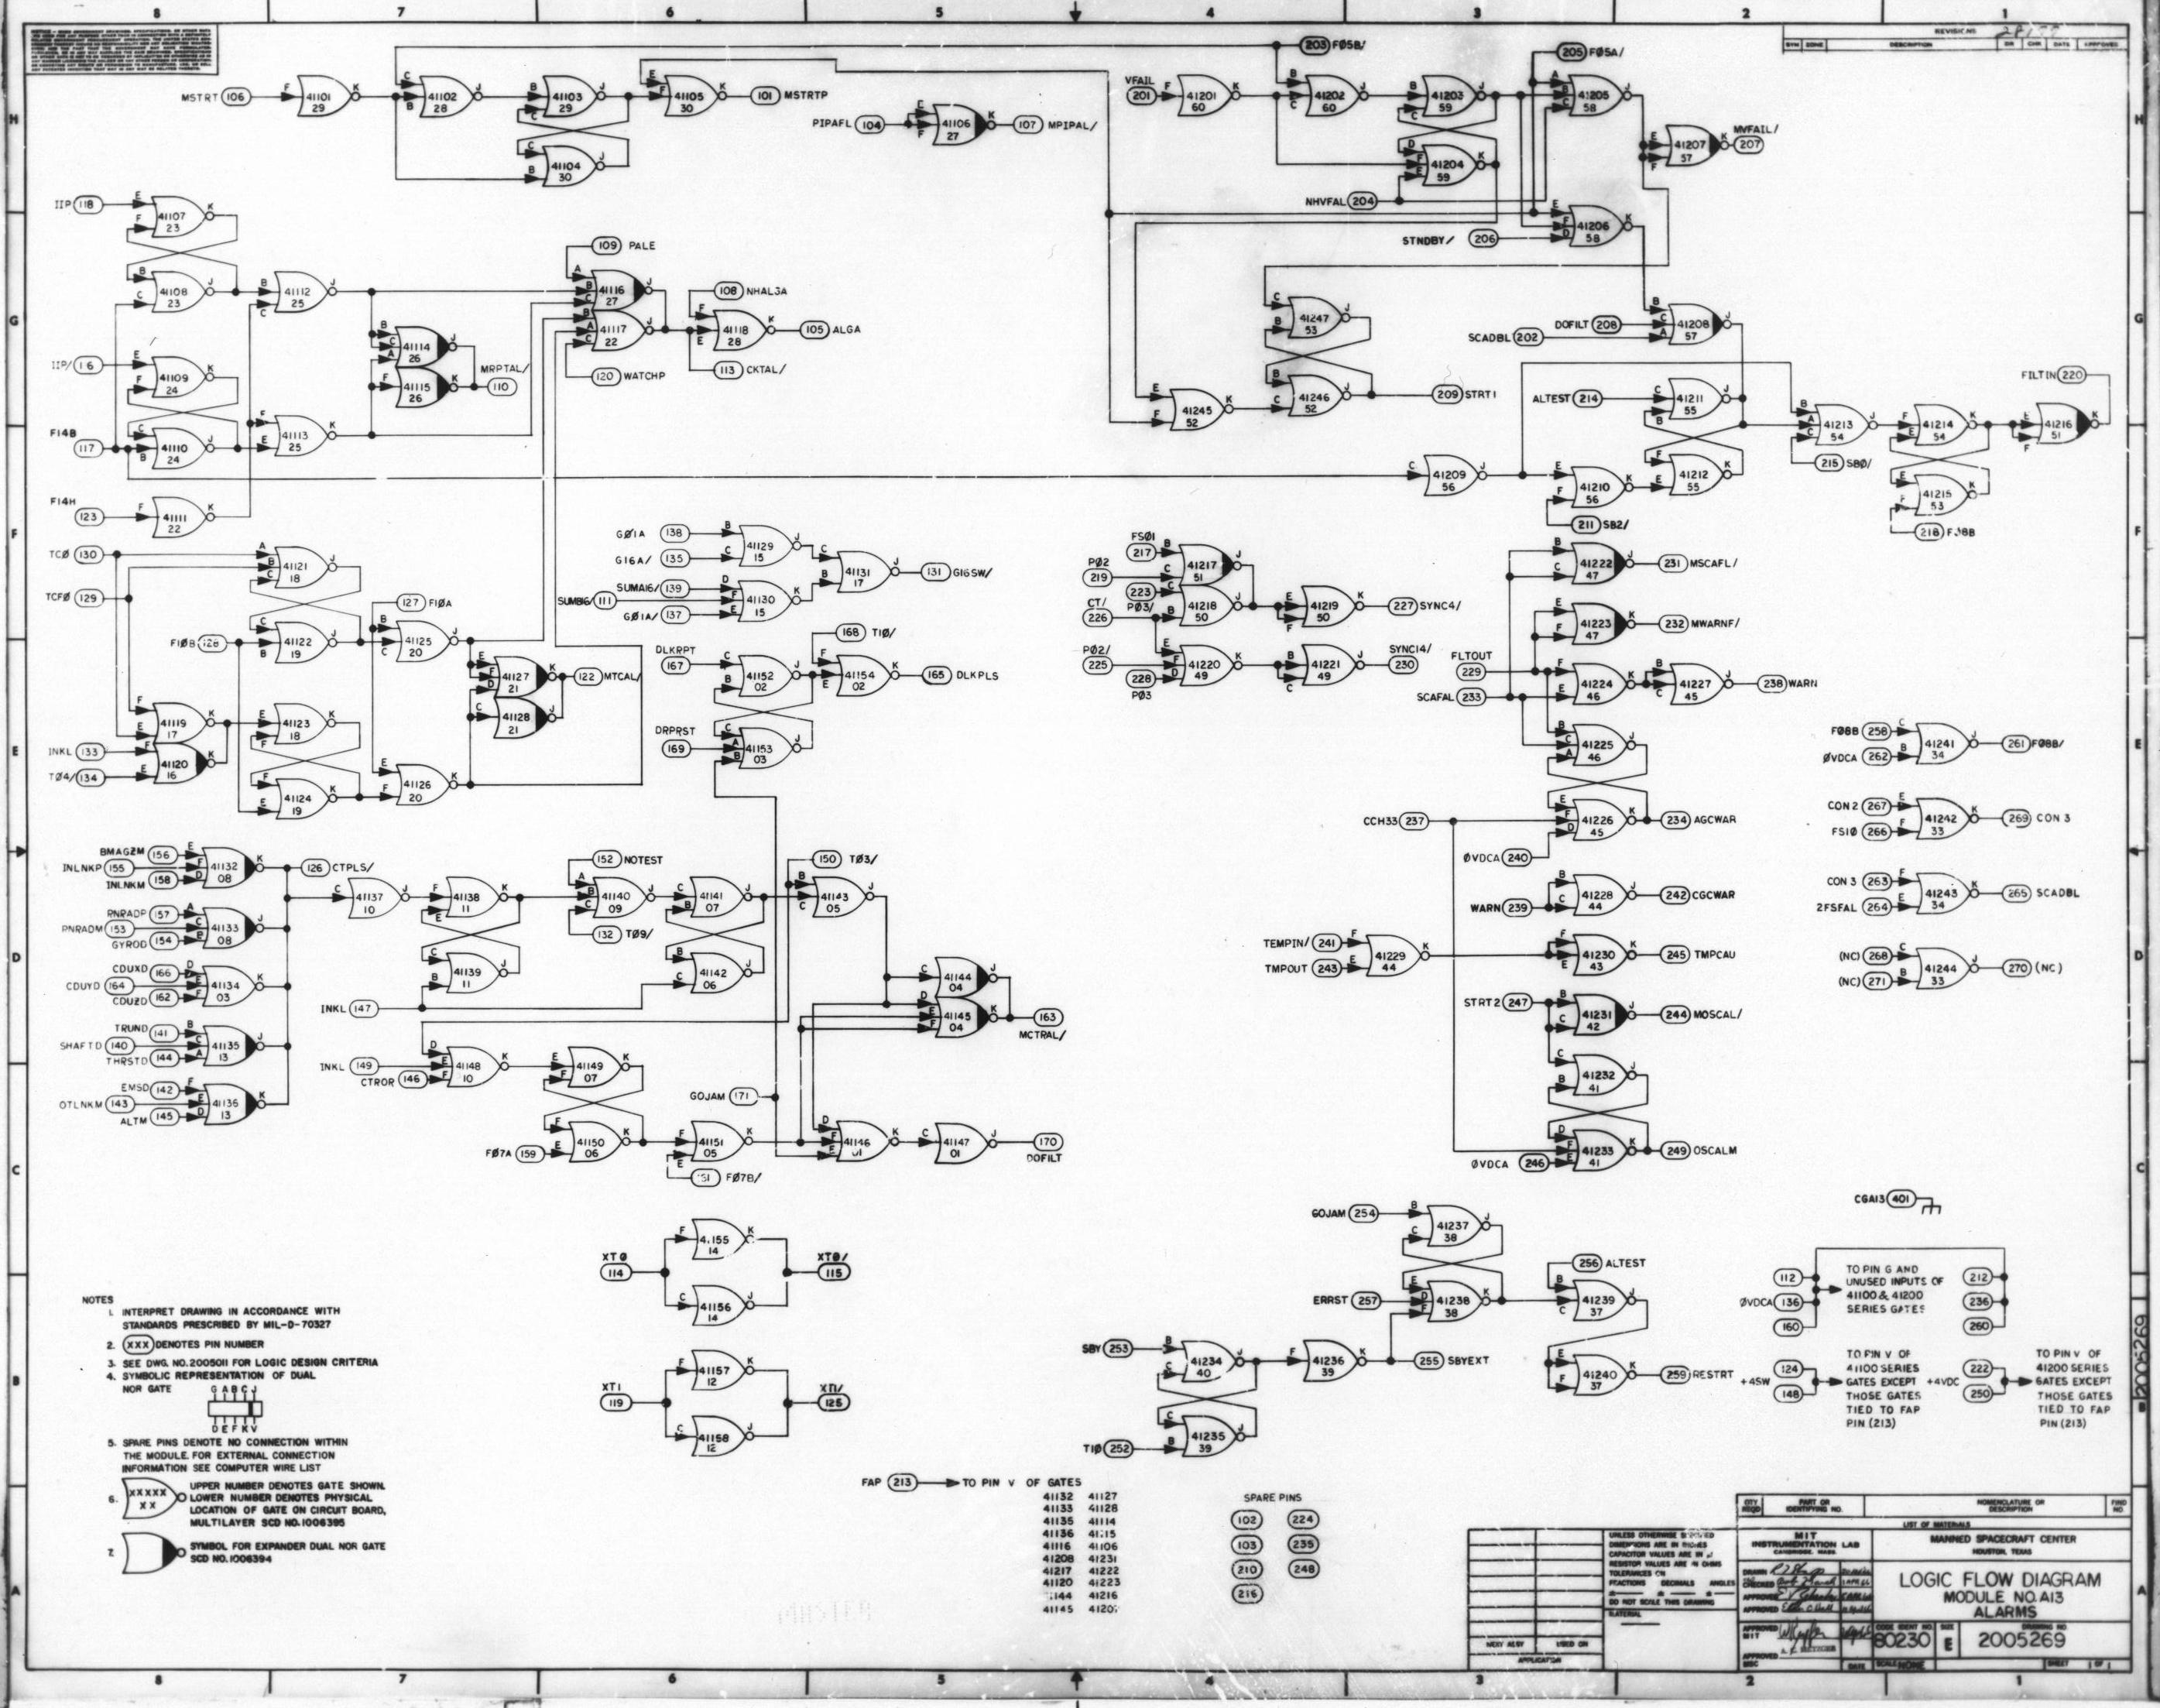 Apollo Guidance Computer Agc Schematics Understanding Circuit Diagrams Drawing No